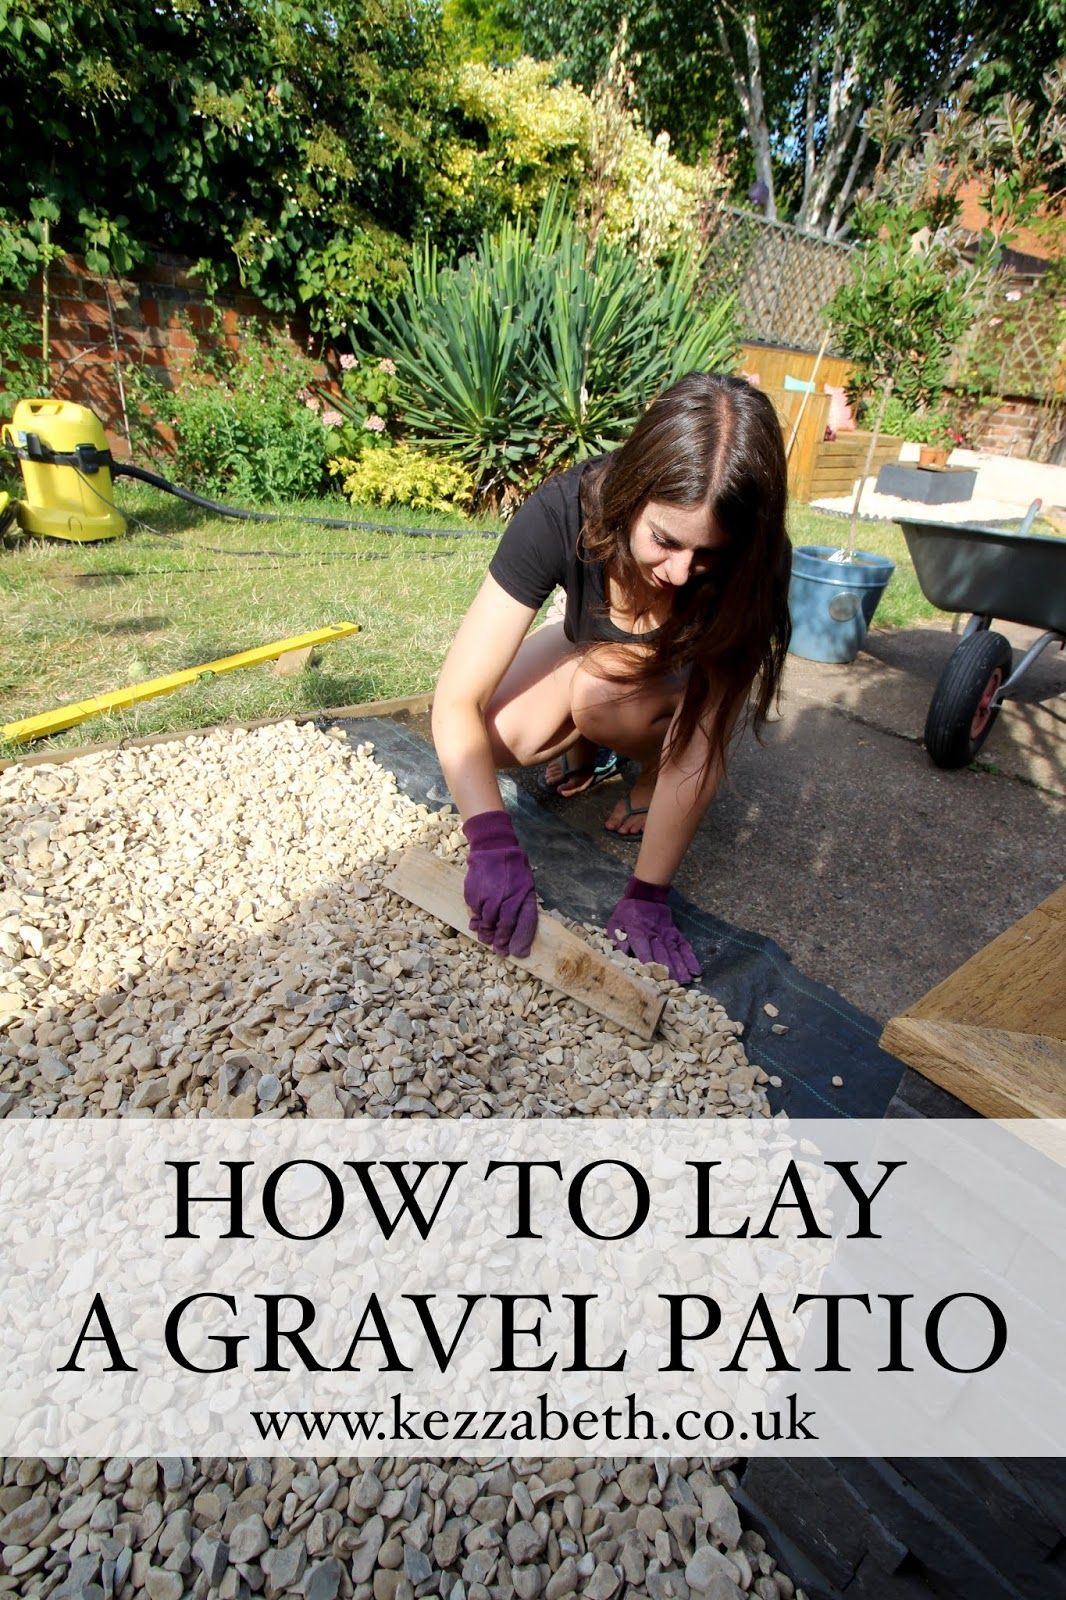 Laying Gravel In the Garden | Gravel patio, Gravel ...